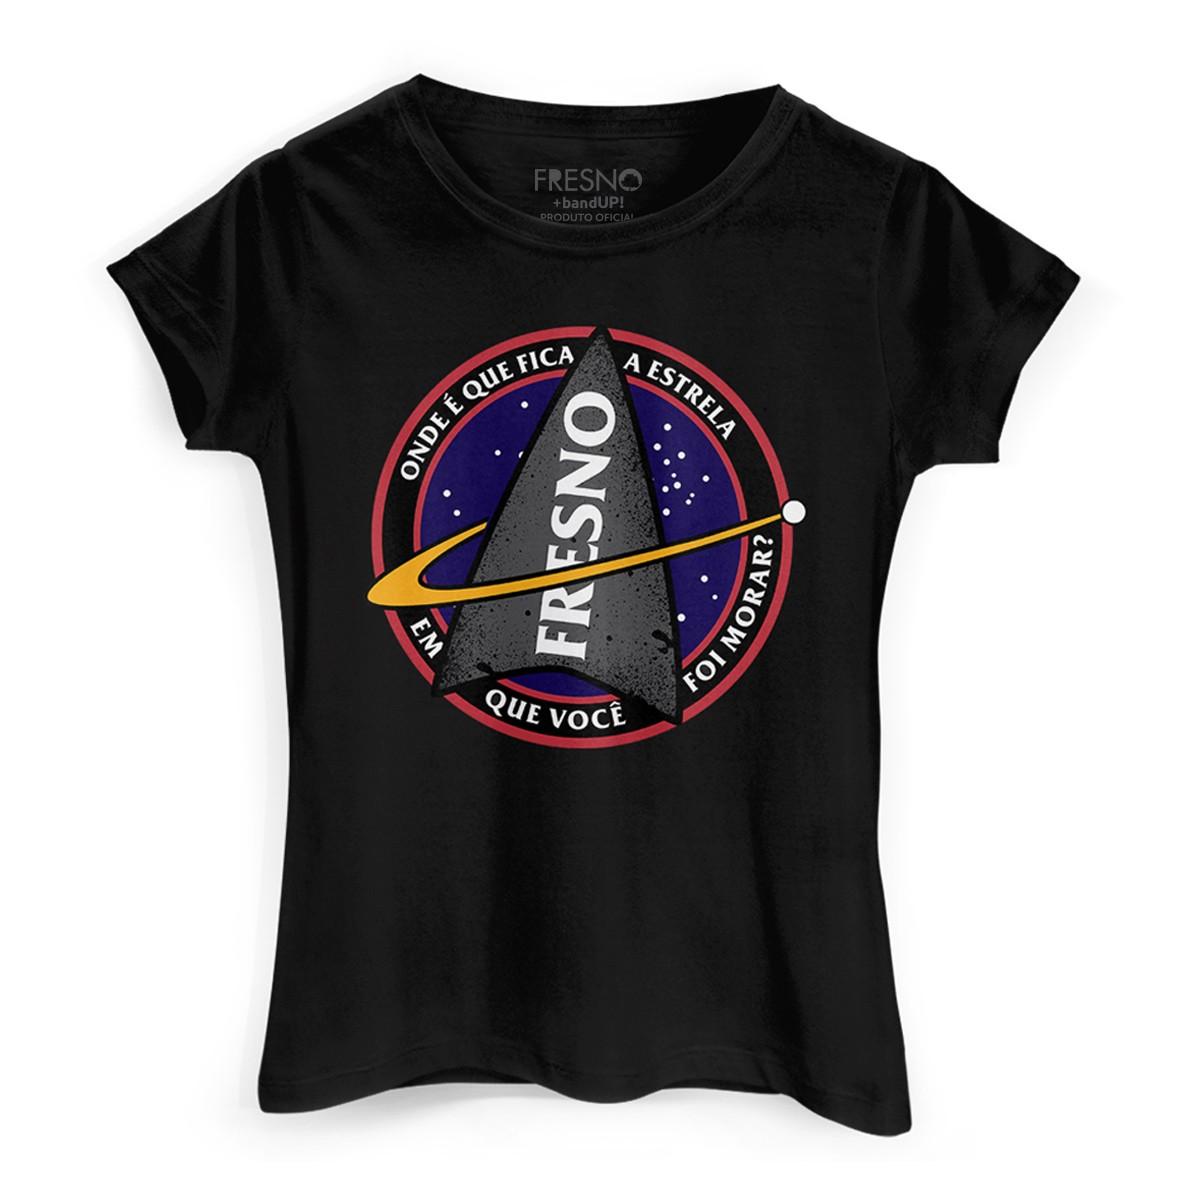 Camiseta Feminina Fresno Discovery